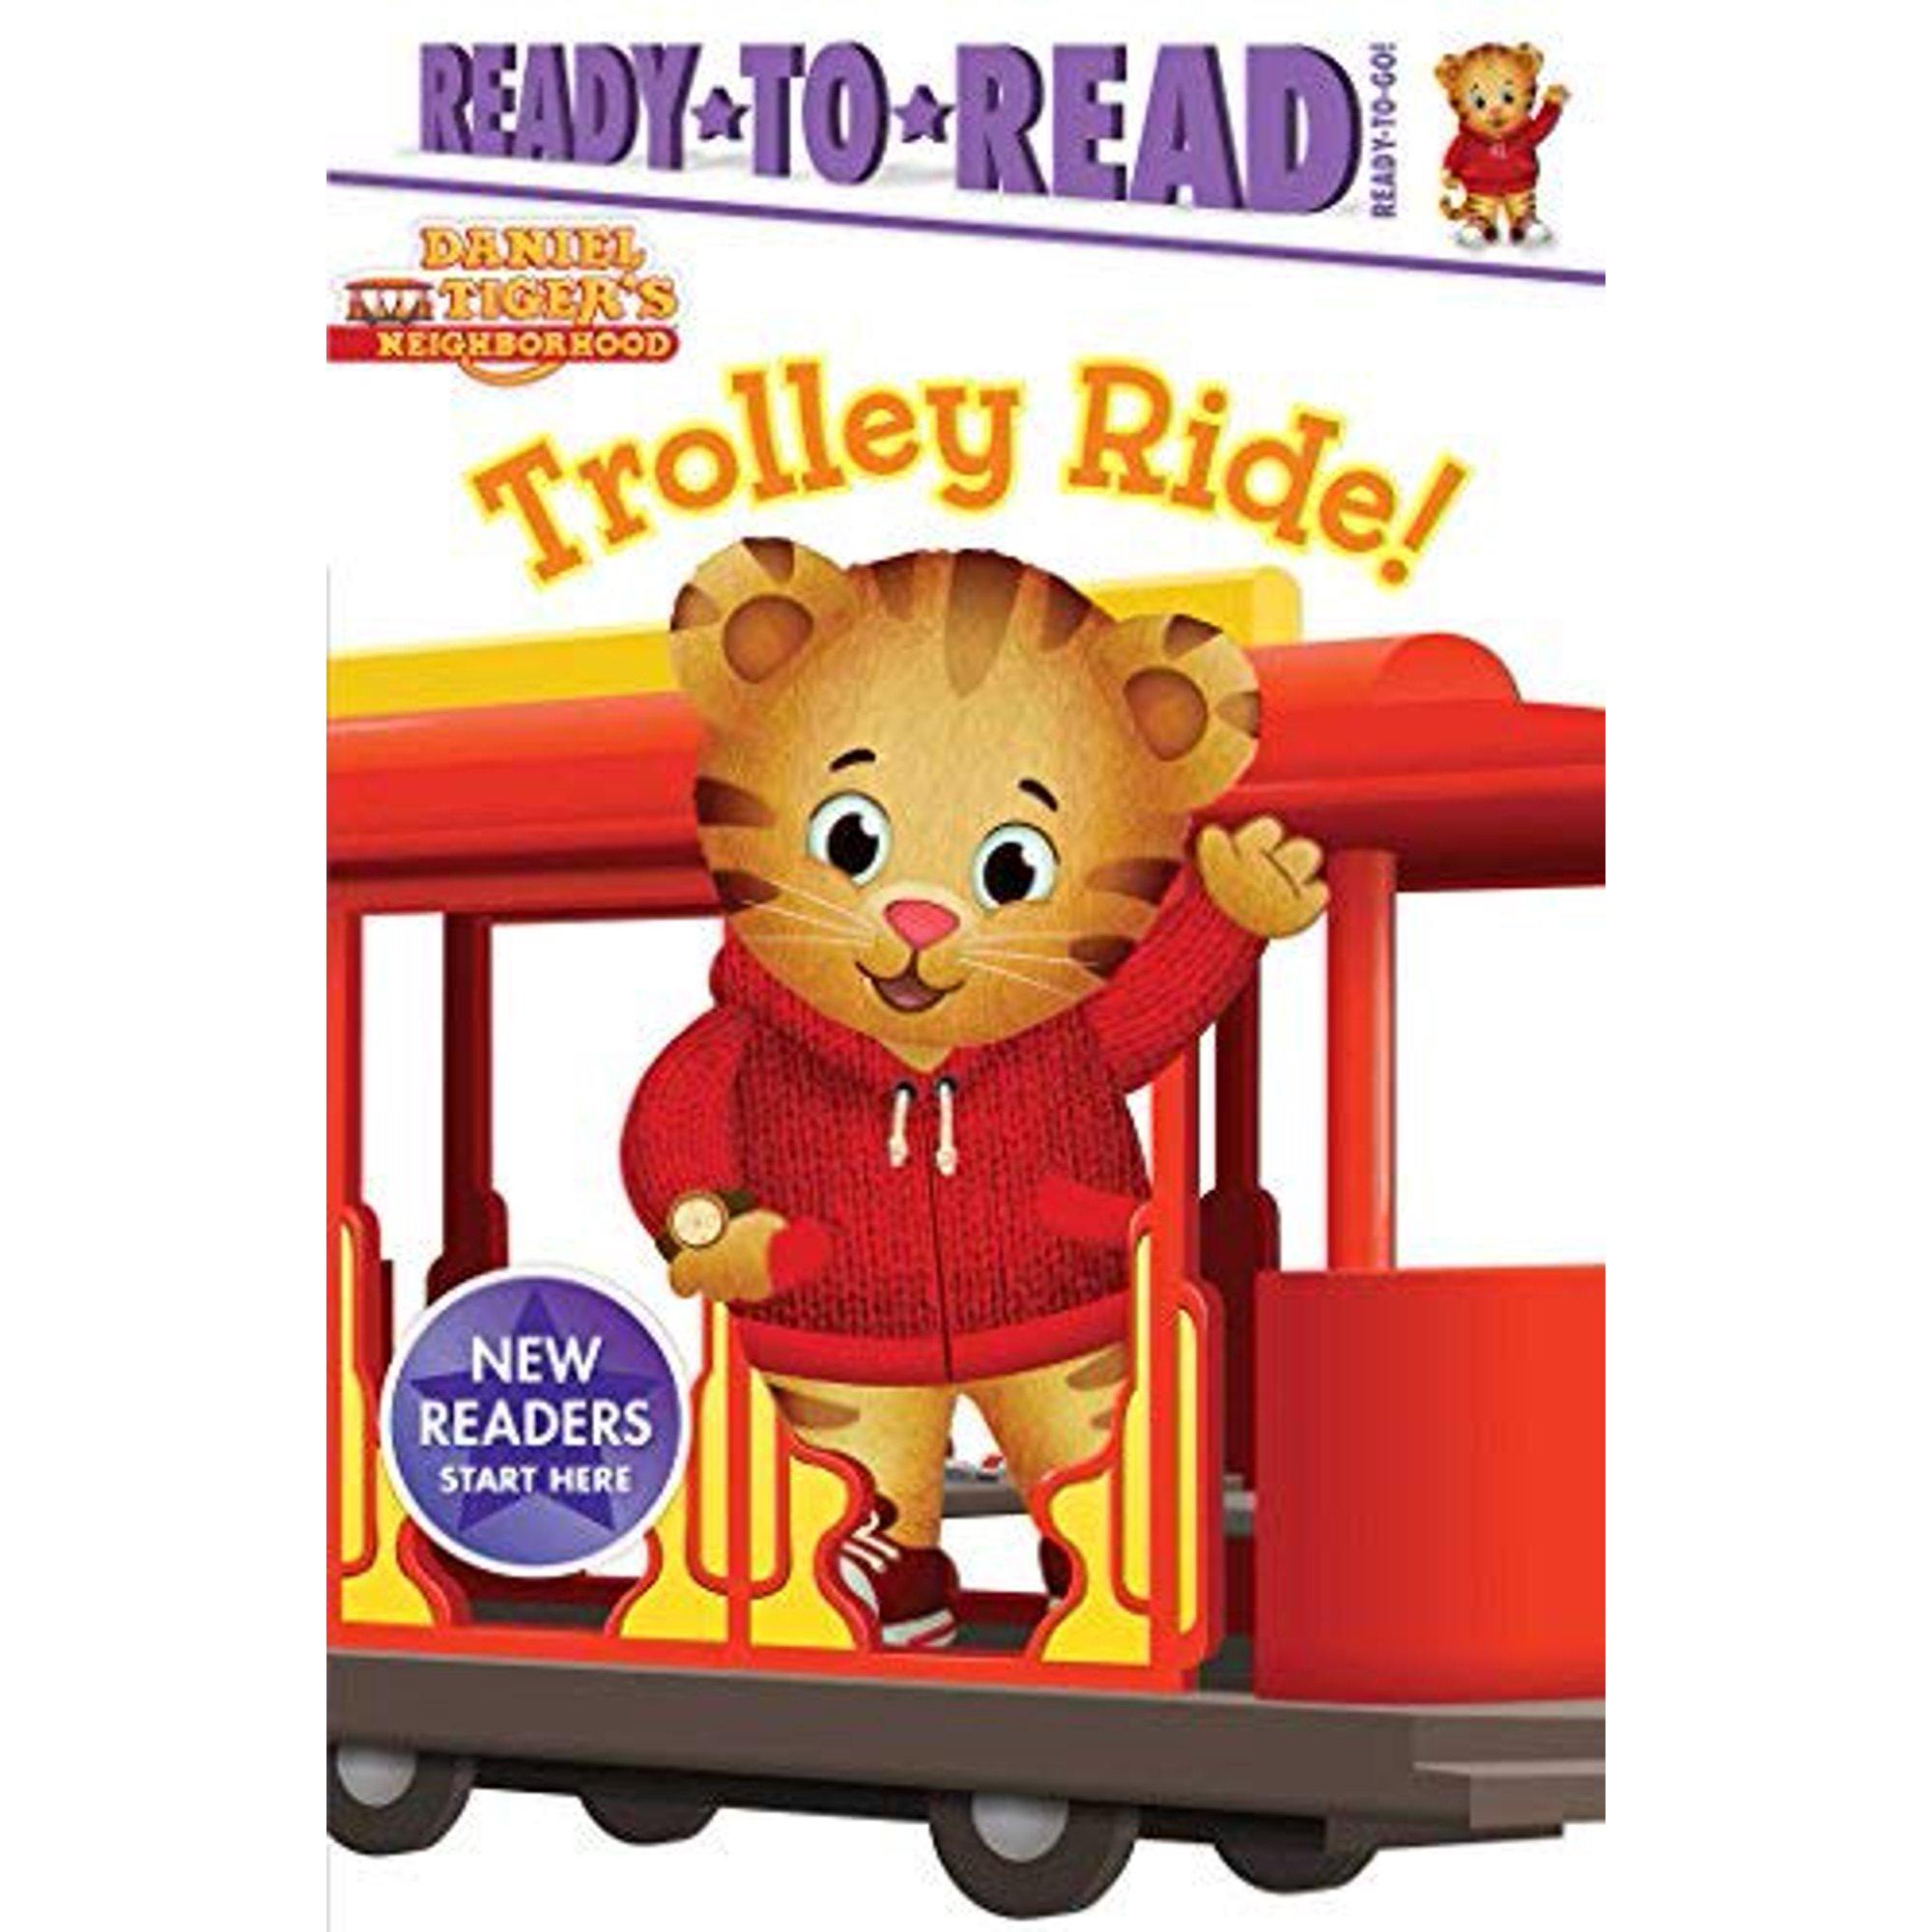 Trolley Ride! (Daniel Tiger's Neighborhood, Ready.